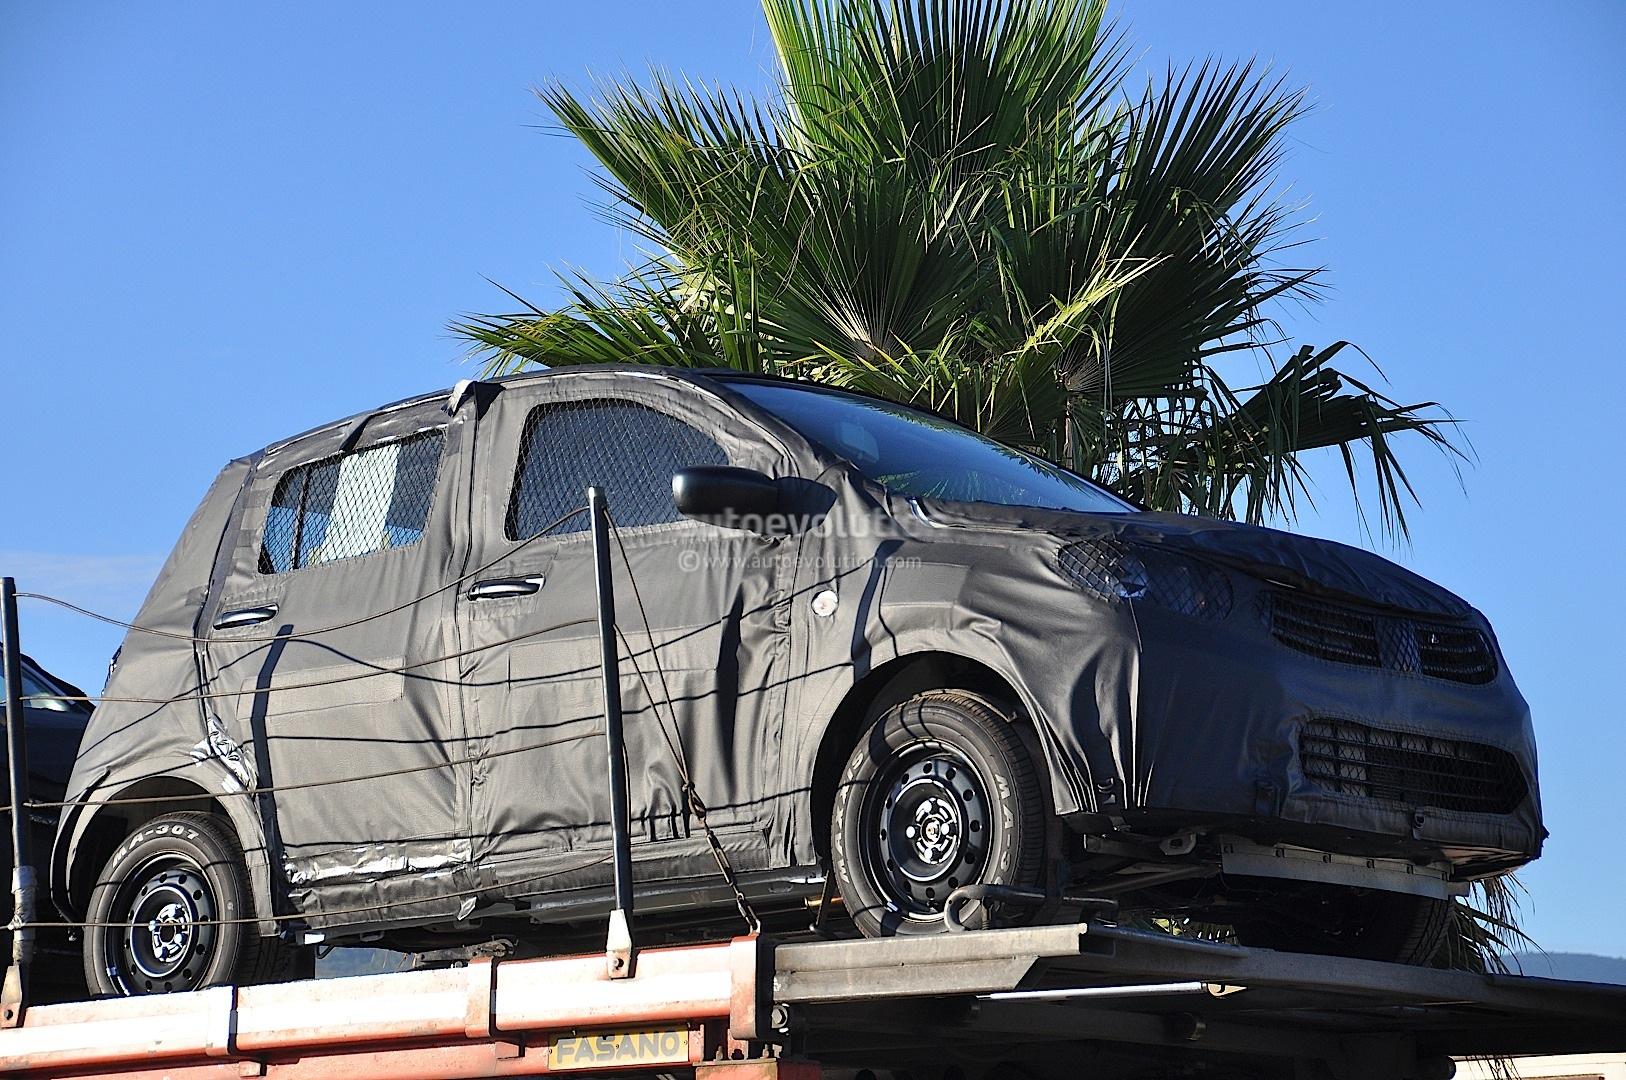 Toyota Of Surprise >> 2014 Suzuki Alto Spied - PakWheels Blog